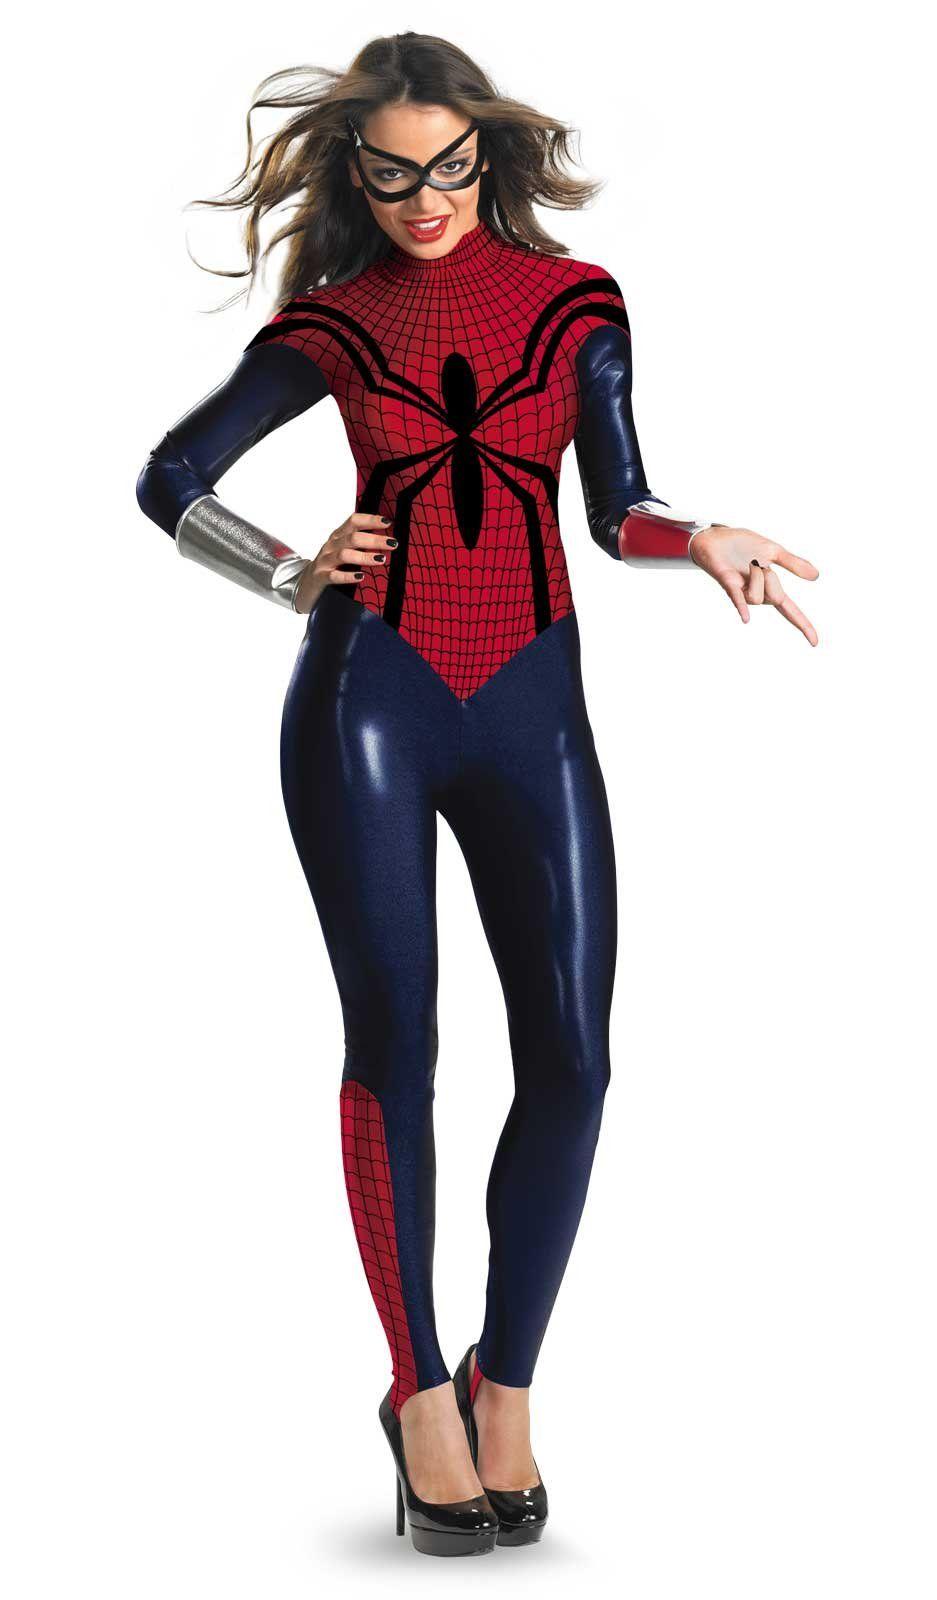 Spider girl bodysuit adult costume spider girl girl online and combine jalie patterns 2916 httpjaliejalie2916 jeuxipadfo Images